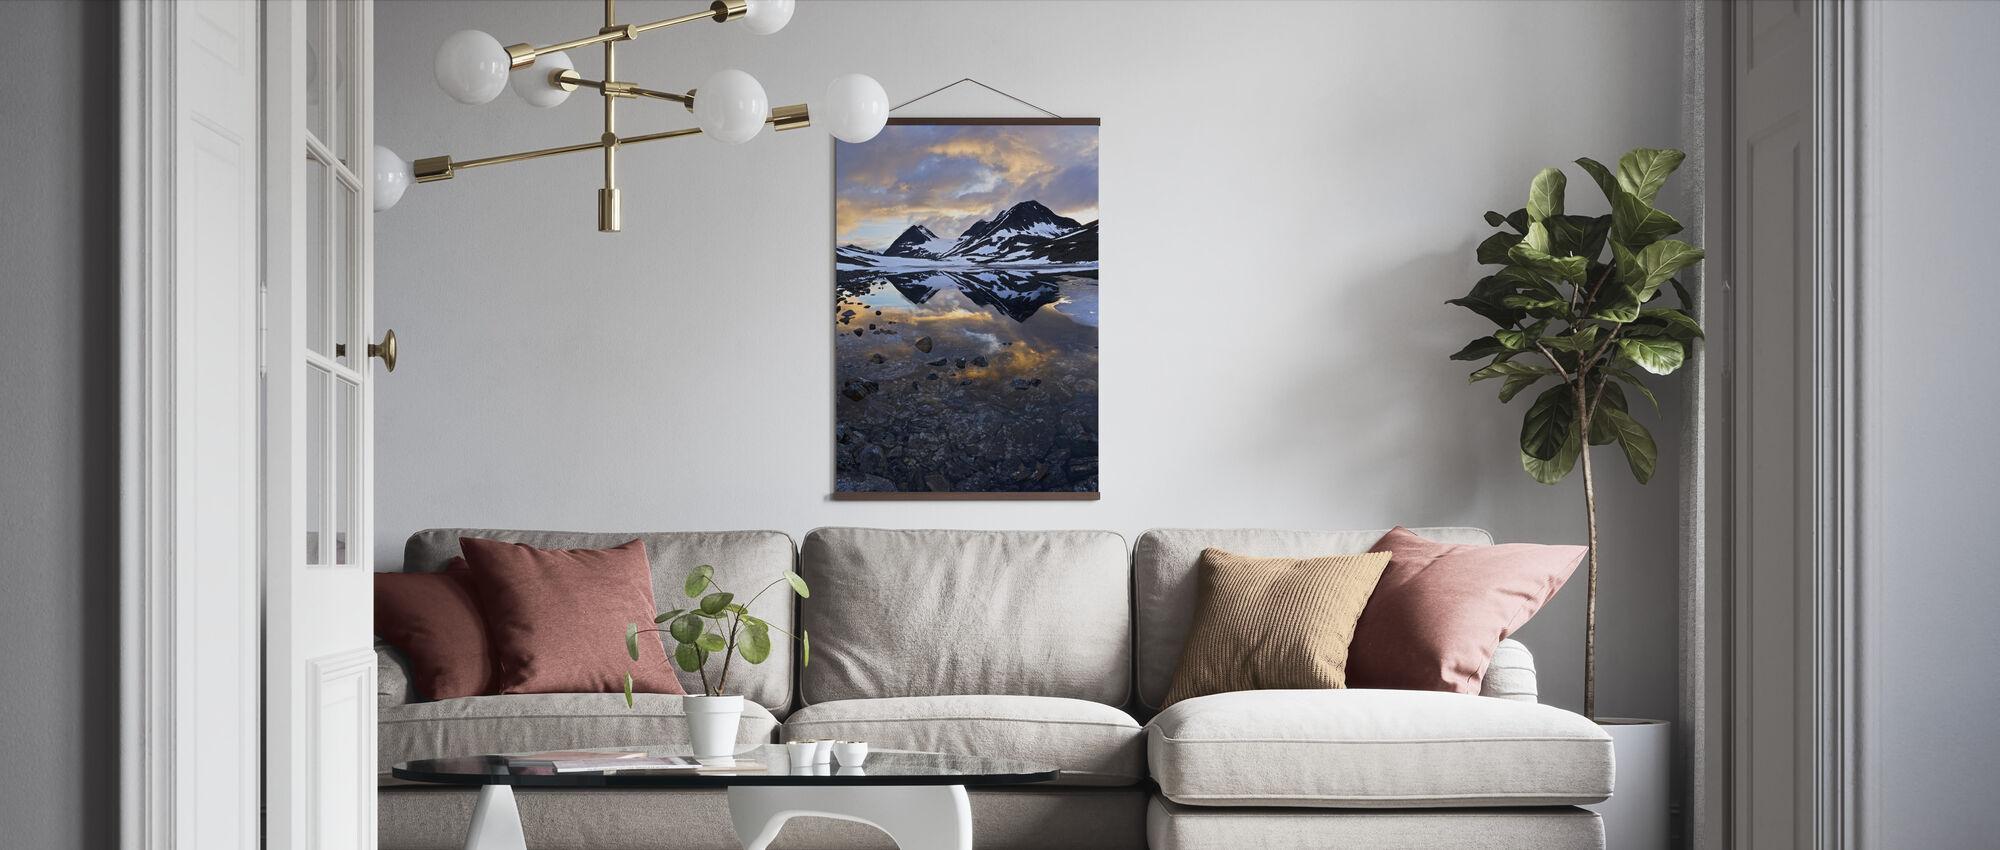 Nallojaure Landscape, Sweden - Plakat - Stue